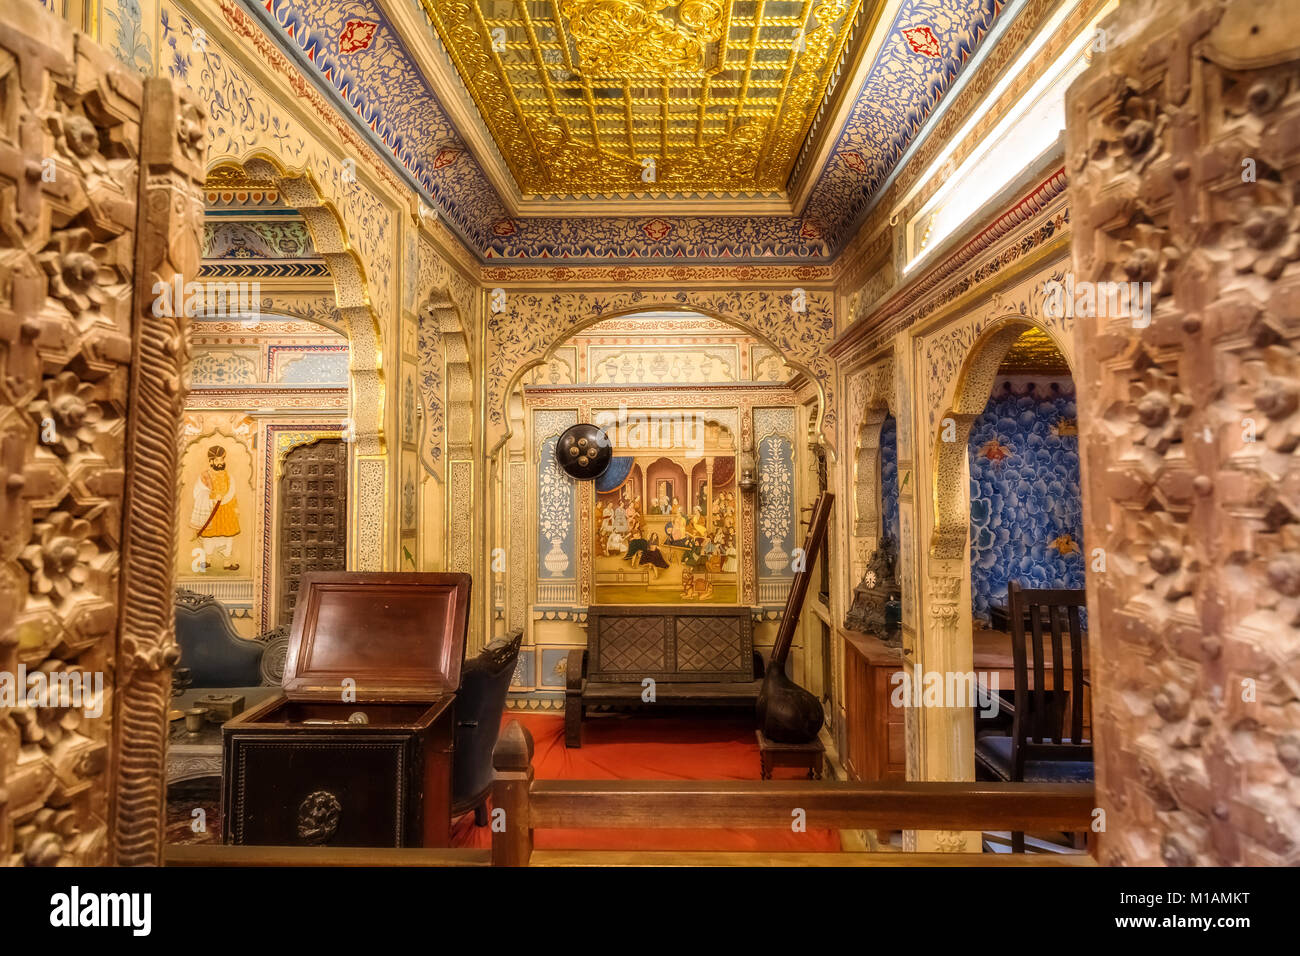 royal palaces india stock photos royal palaces india. Black Bedroom Furniture Sets. Home Design Ideas